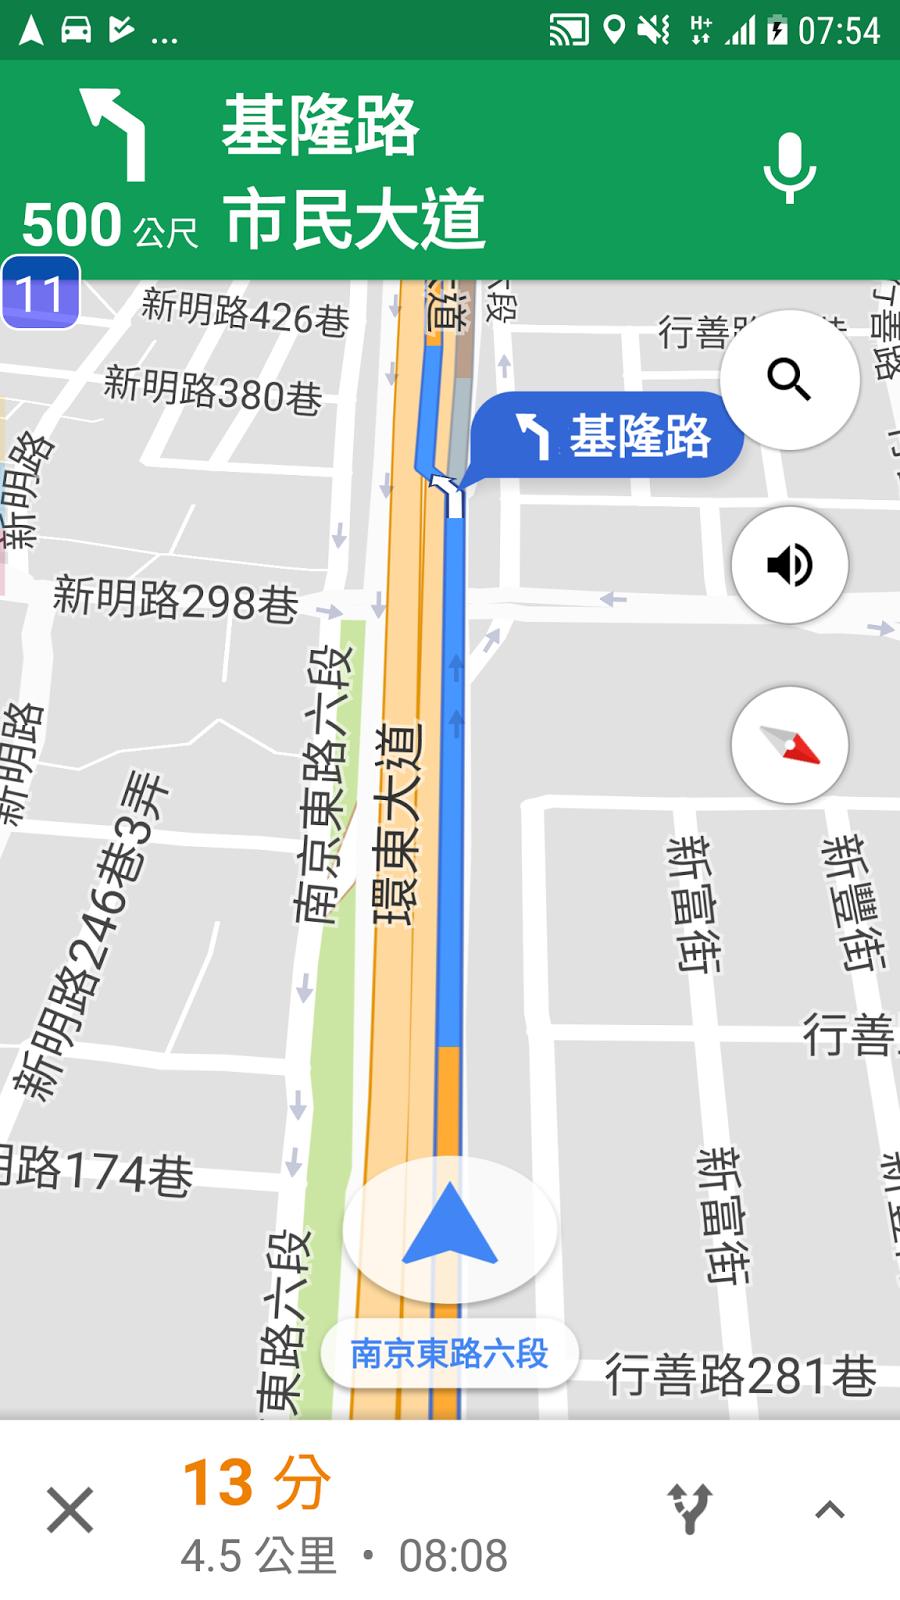 首席測速照相 Android iOS App 幫 Google 地圖加路況超速語音